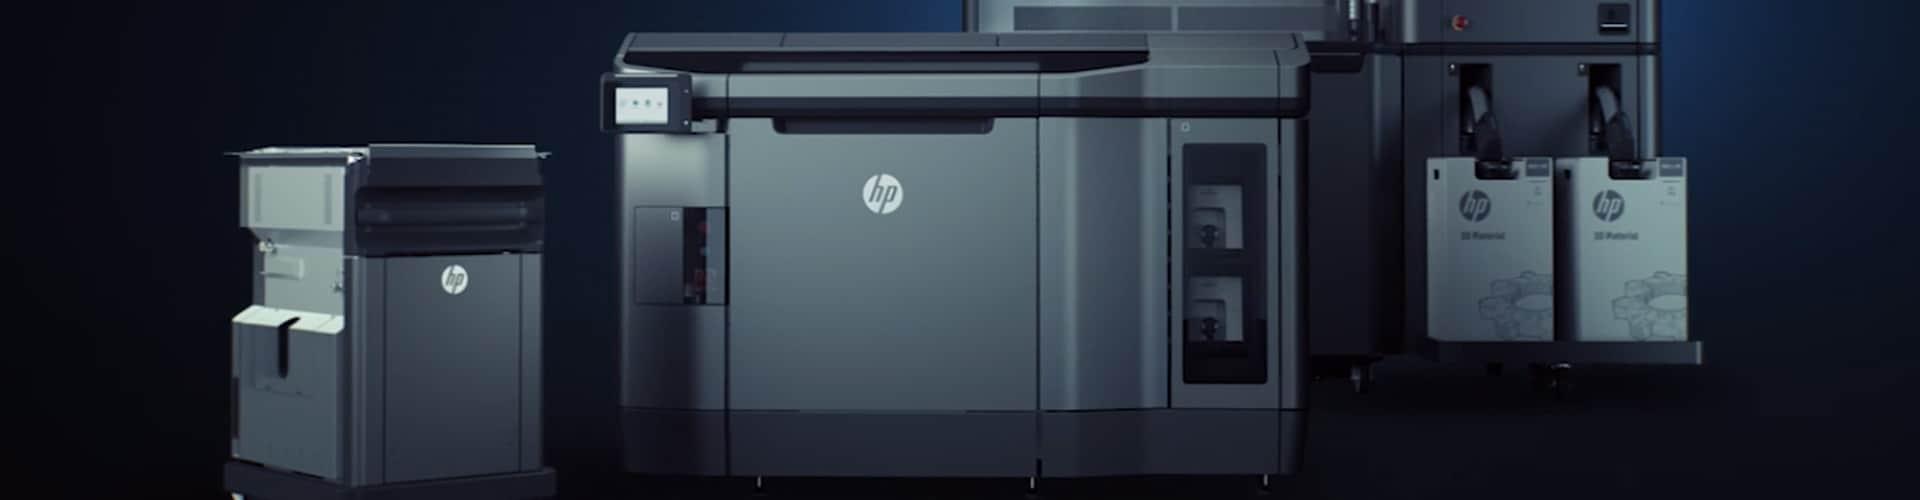 HP Jet Fusion 3D 4200 Review